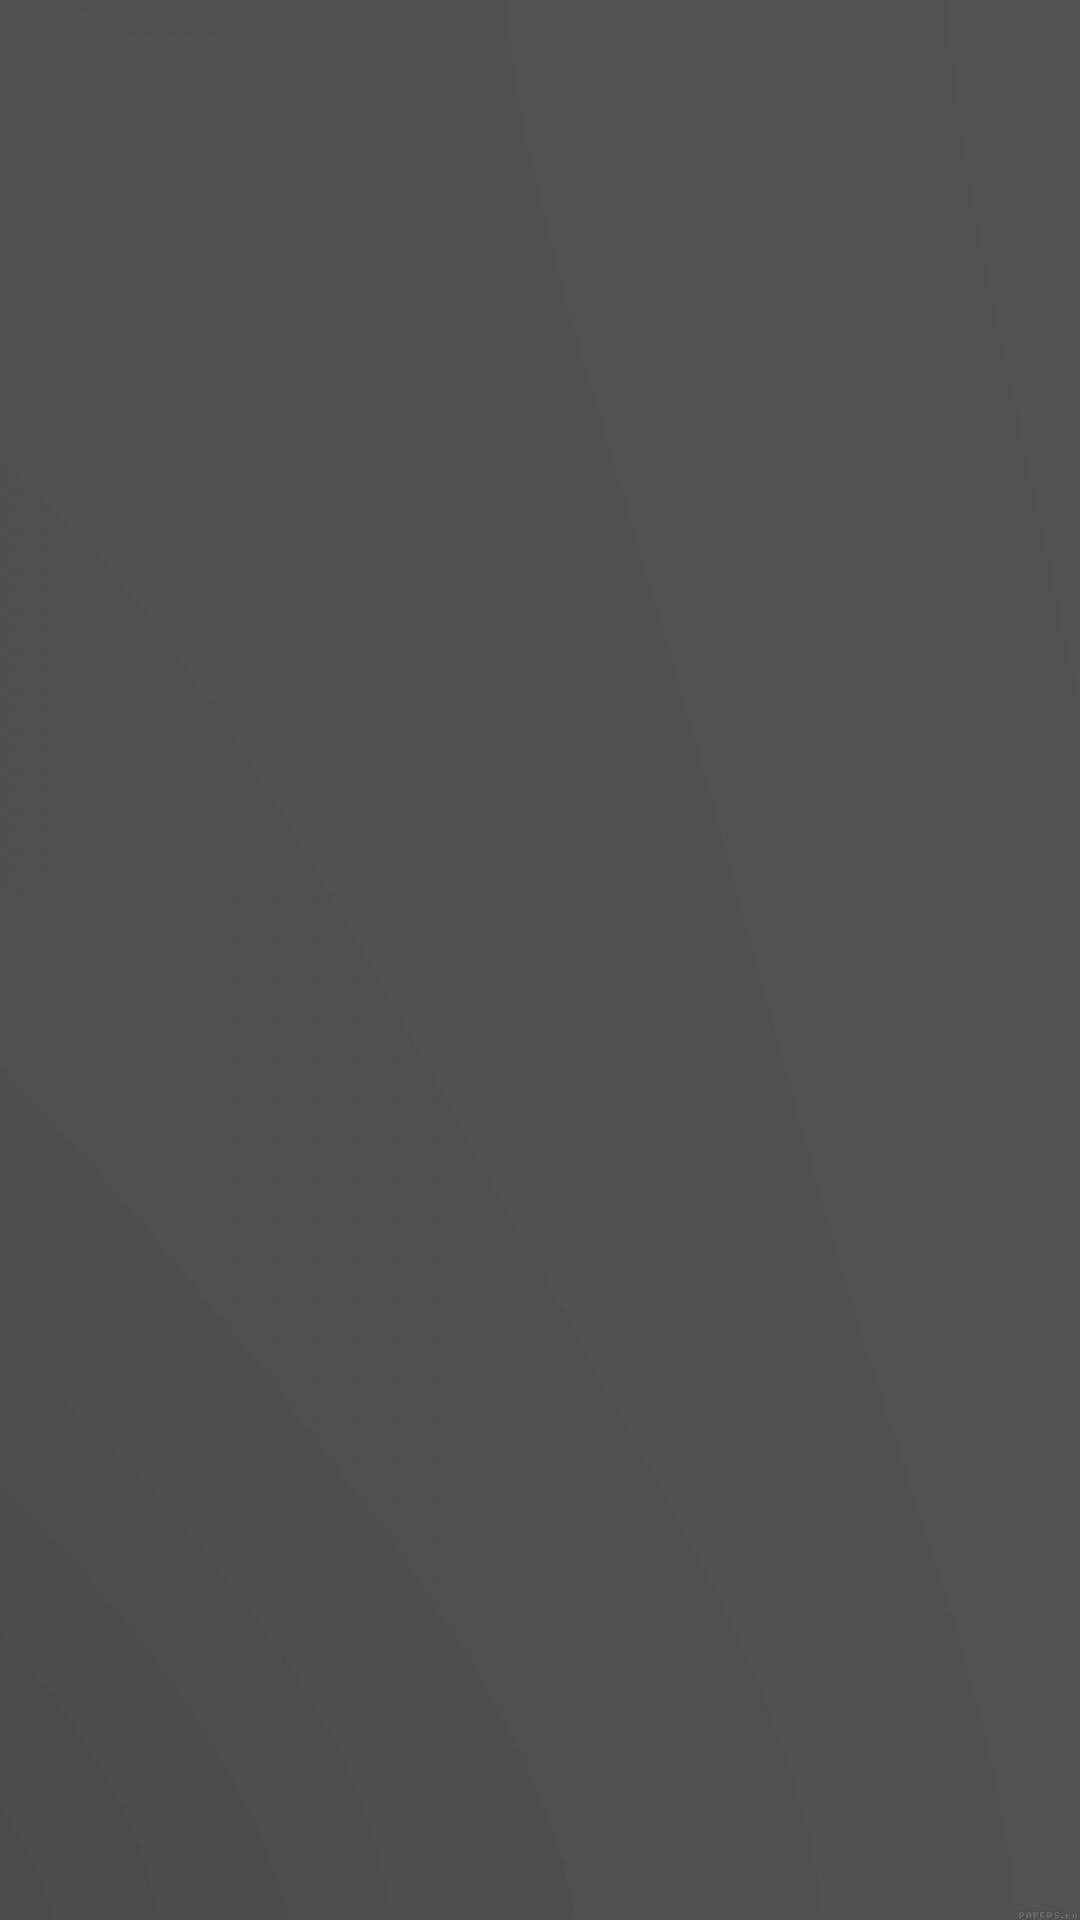 Apple Slate Gray Blurry Gradation Blur